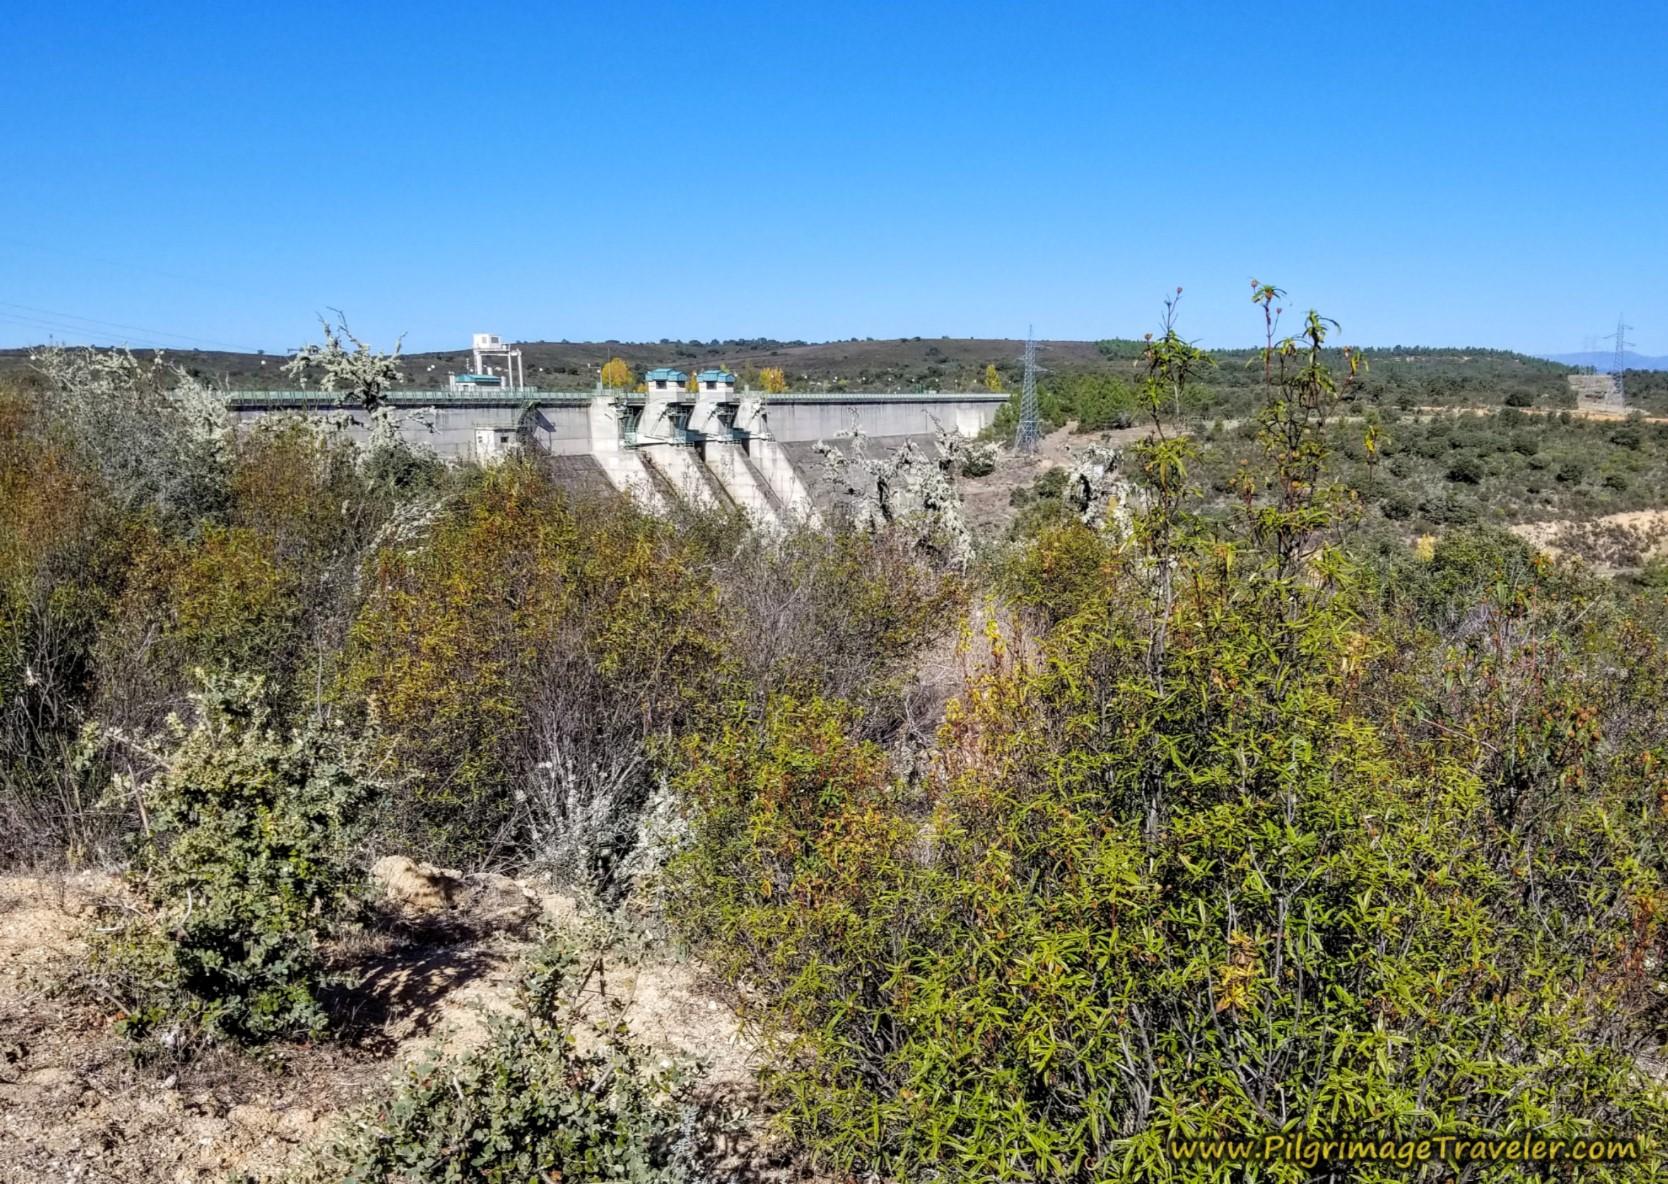 Reservoir Dam Ahead on the Camino Sanabrés from Santa Marta de Tera to Rionegro del Puente